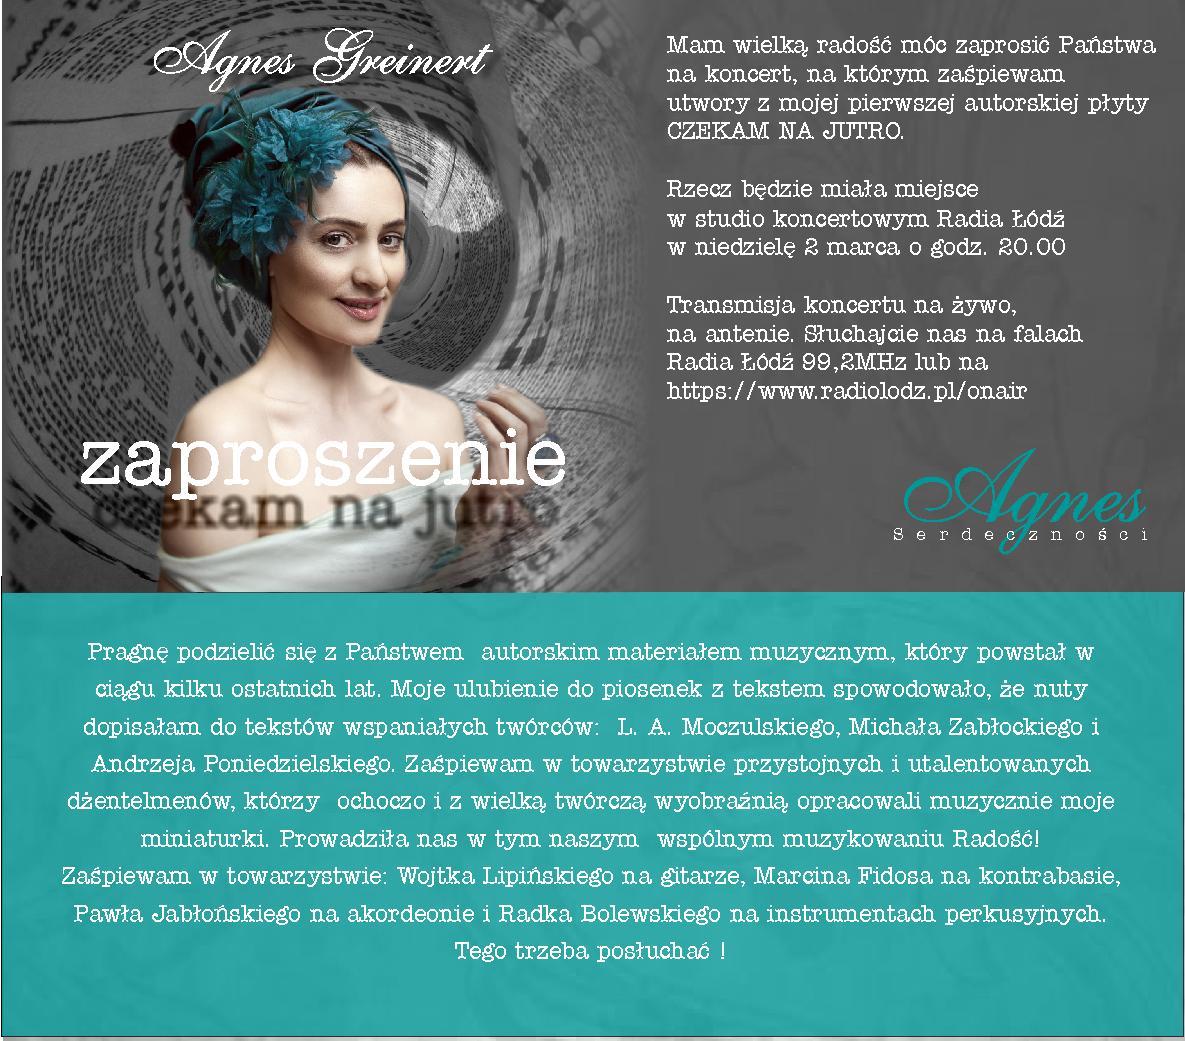 Agnieszka Greinert - Czekam na jutro - Zaproszenie na koncert